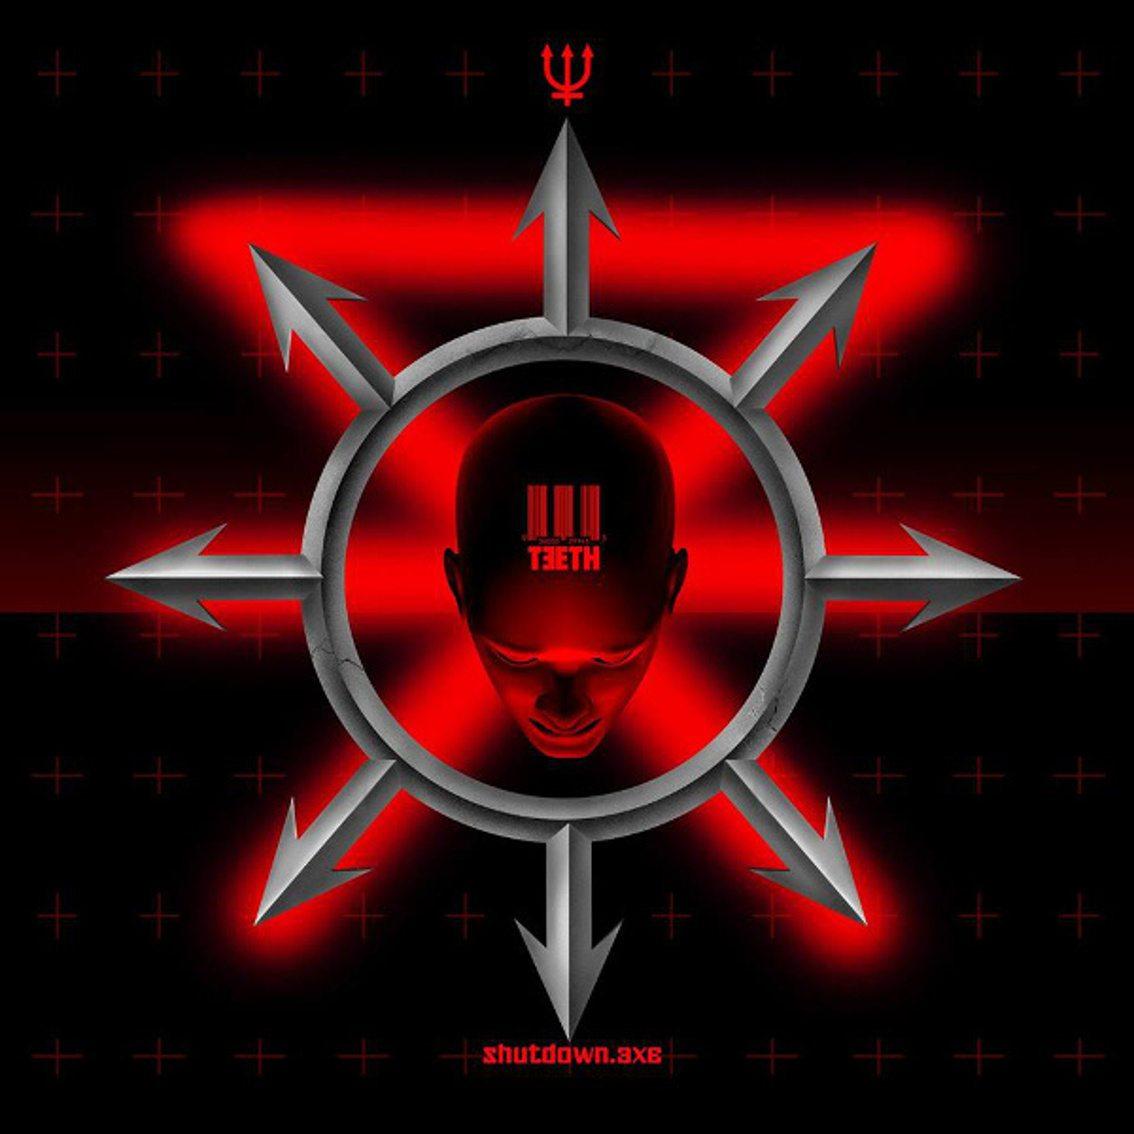 3TEETH announce new studio album'Shutdown.exe' - pre-order the vinyl/CD right now